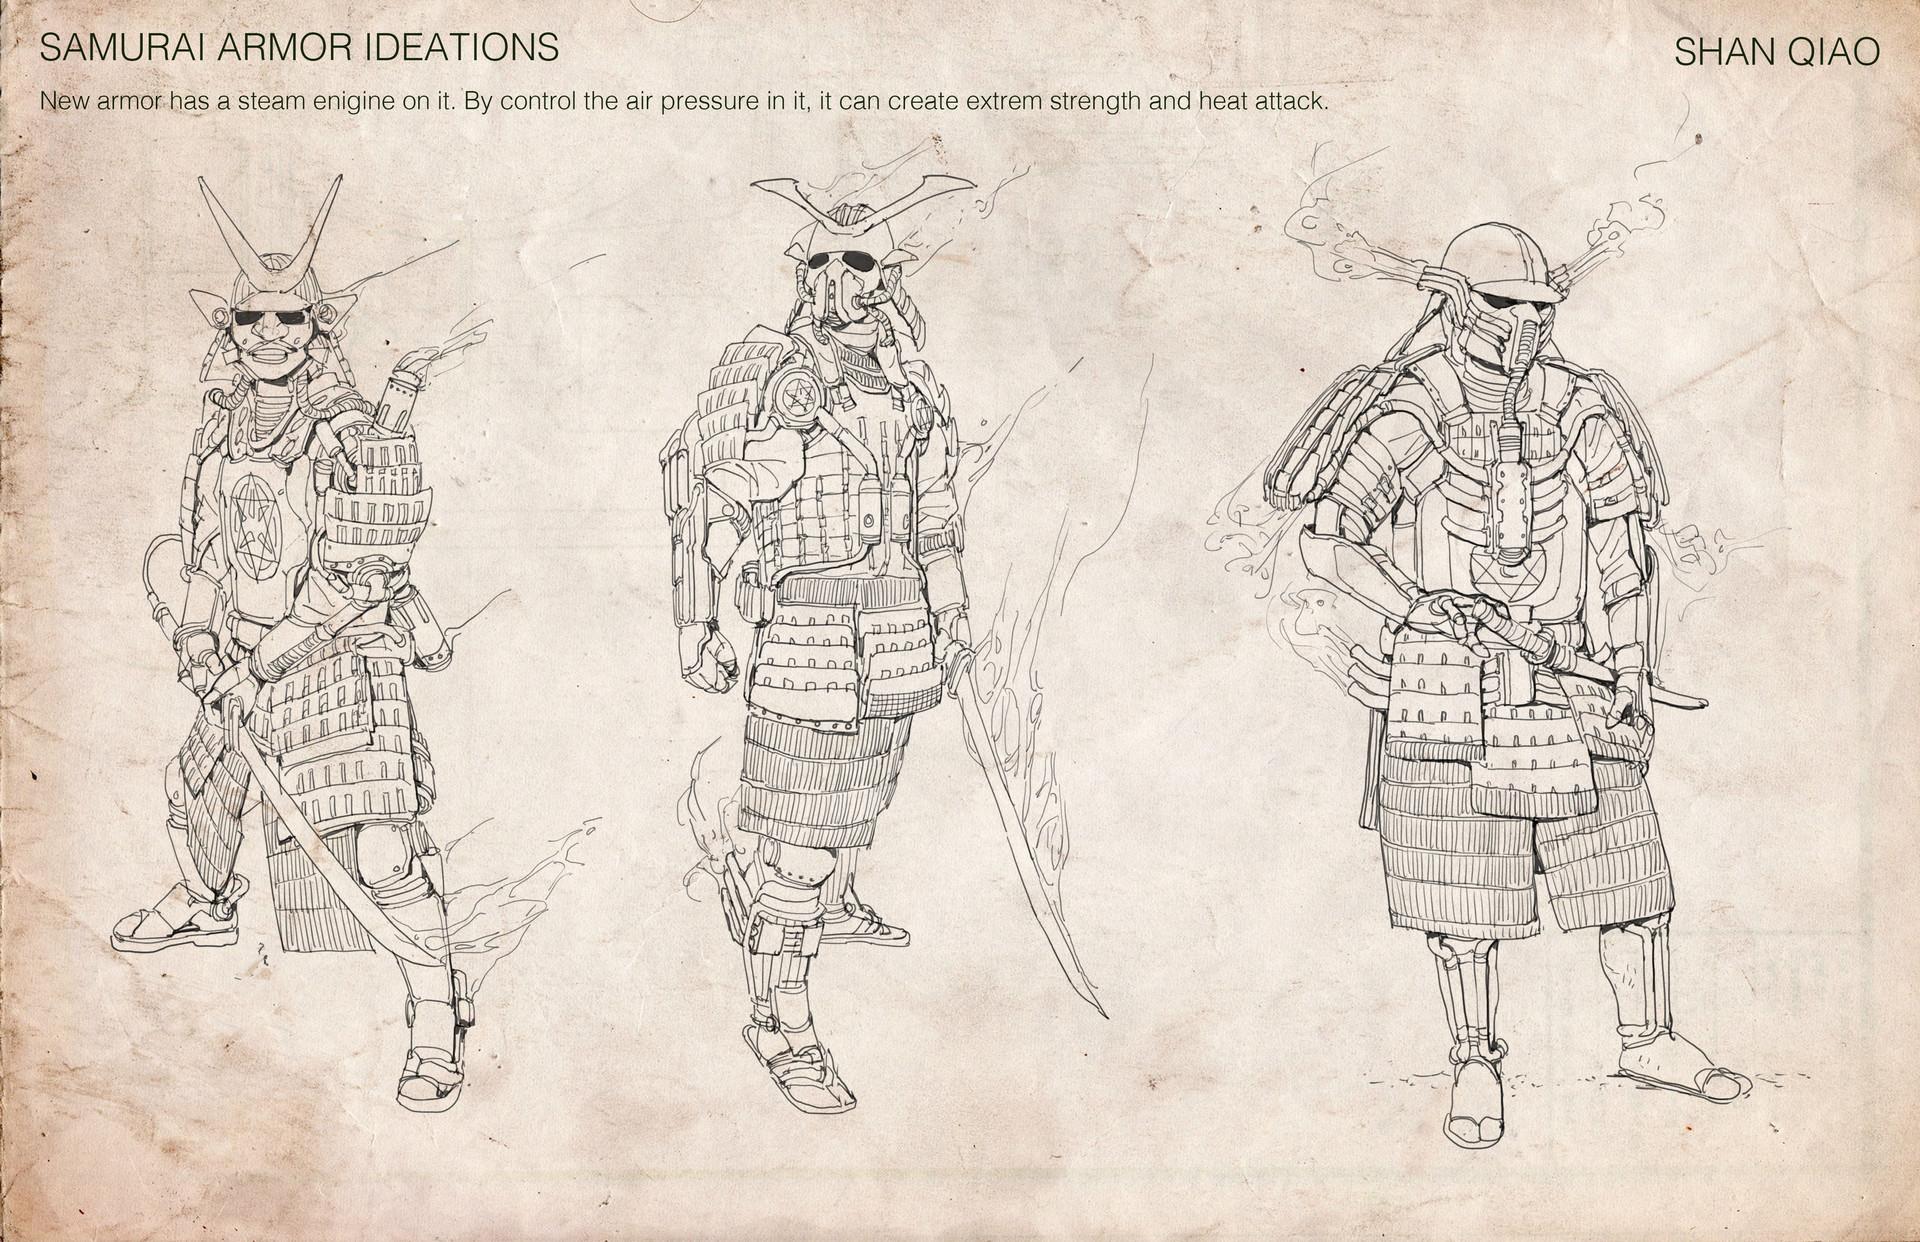 Shan qiao samurai armor ideations